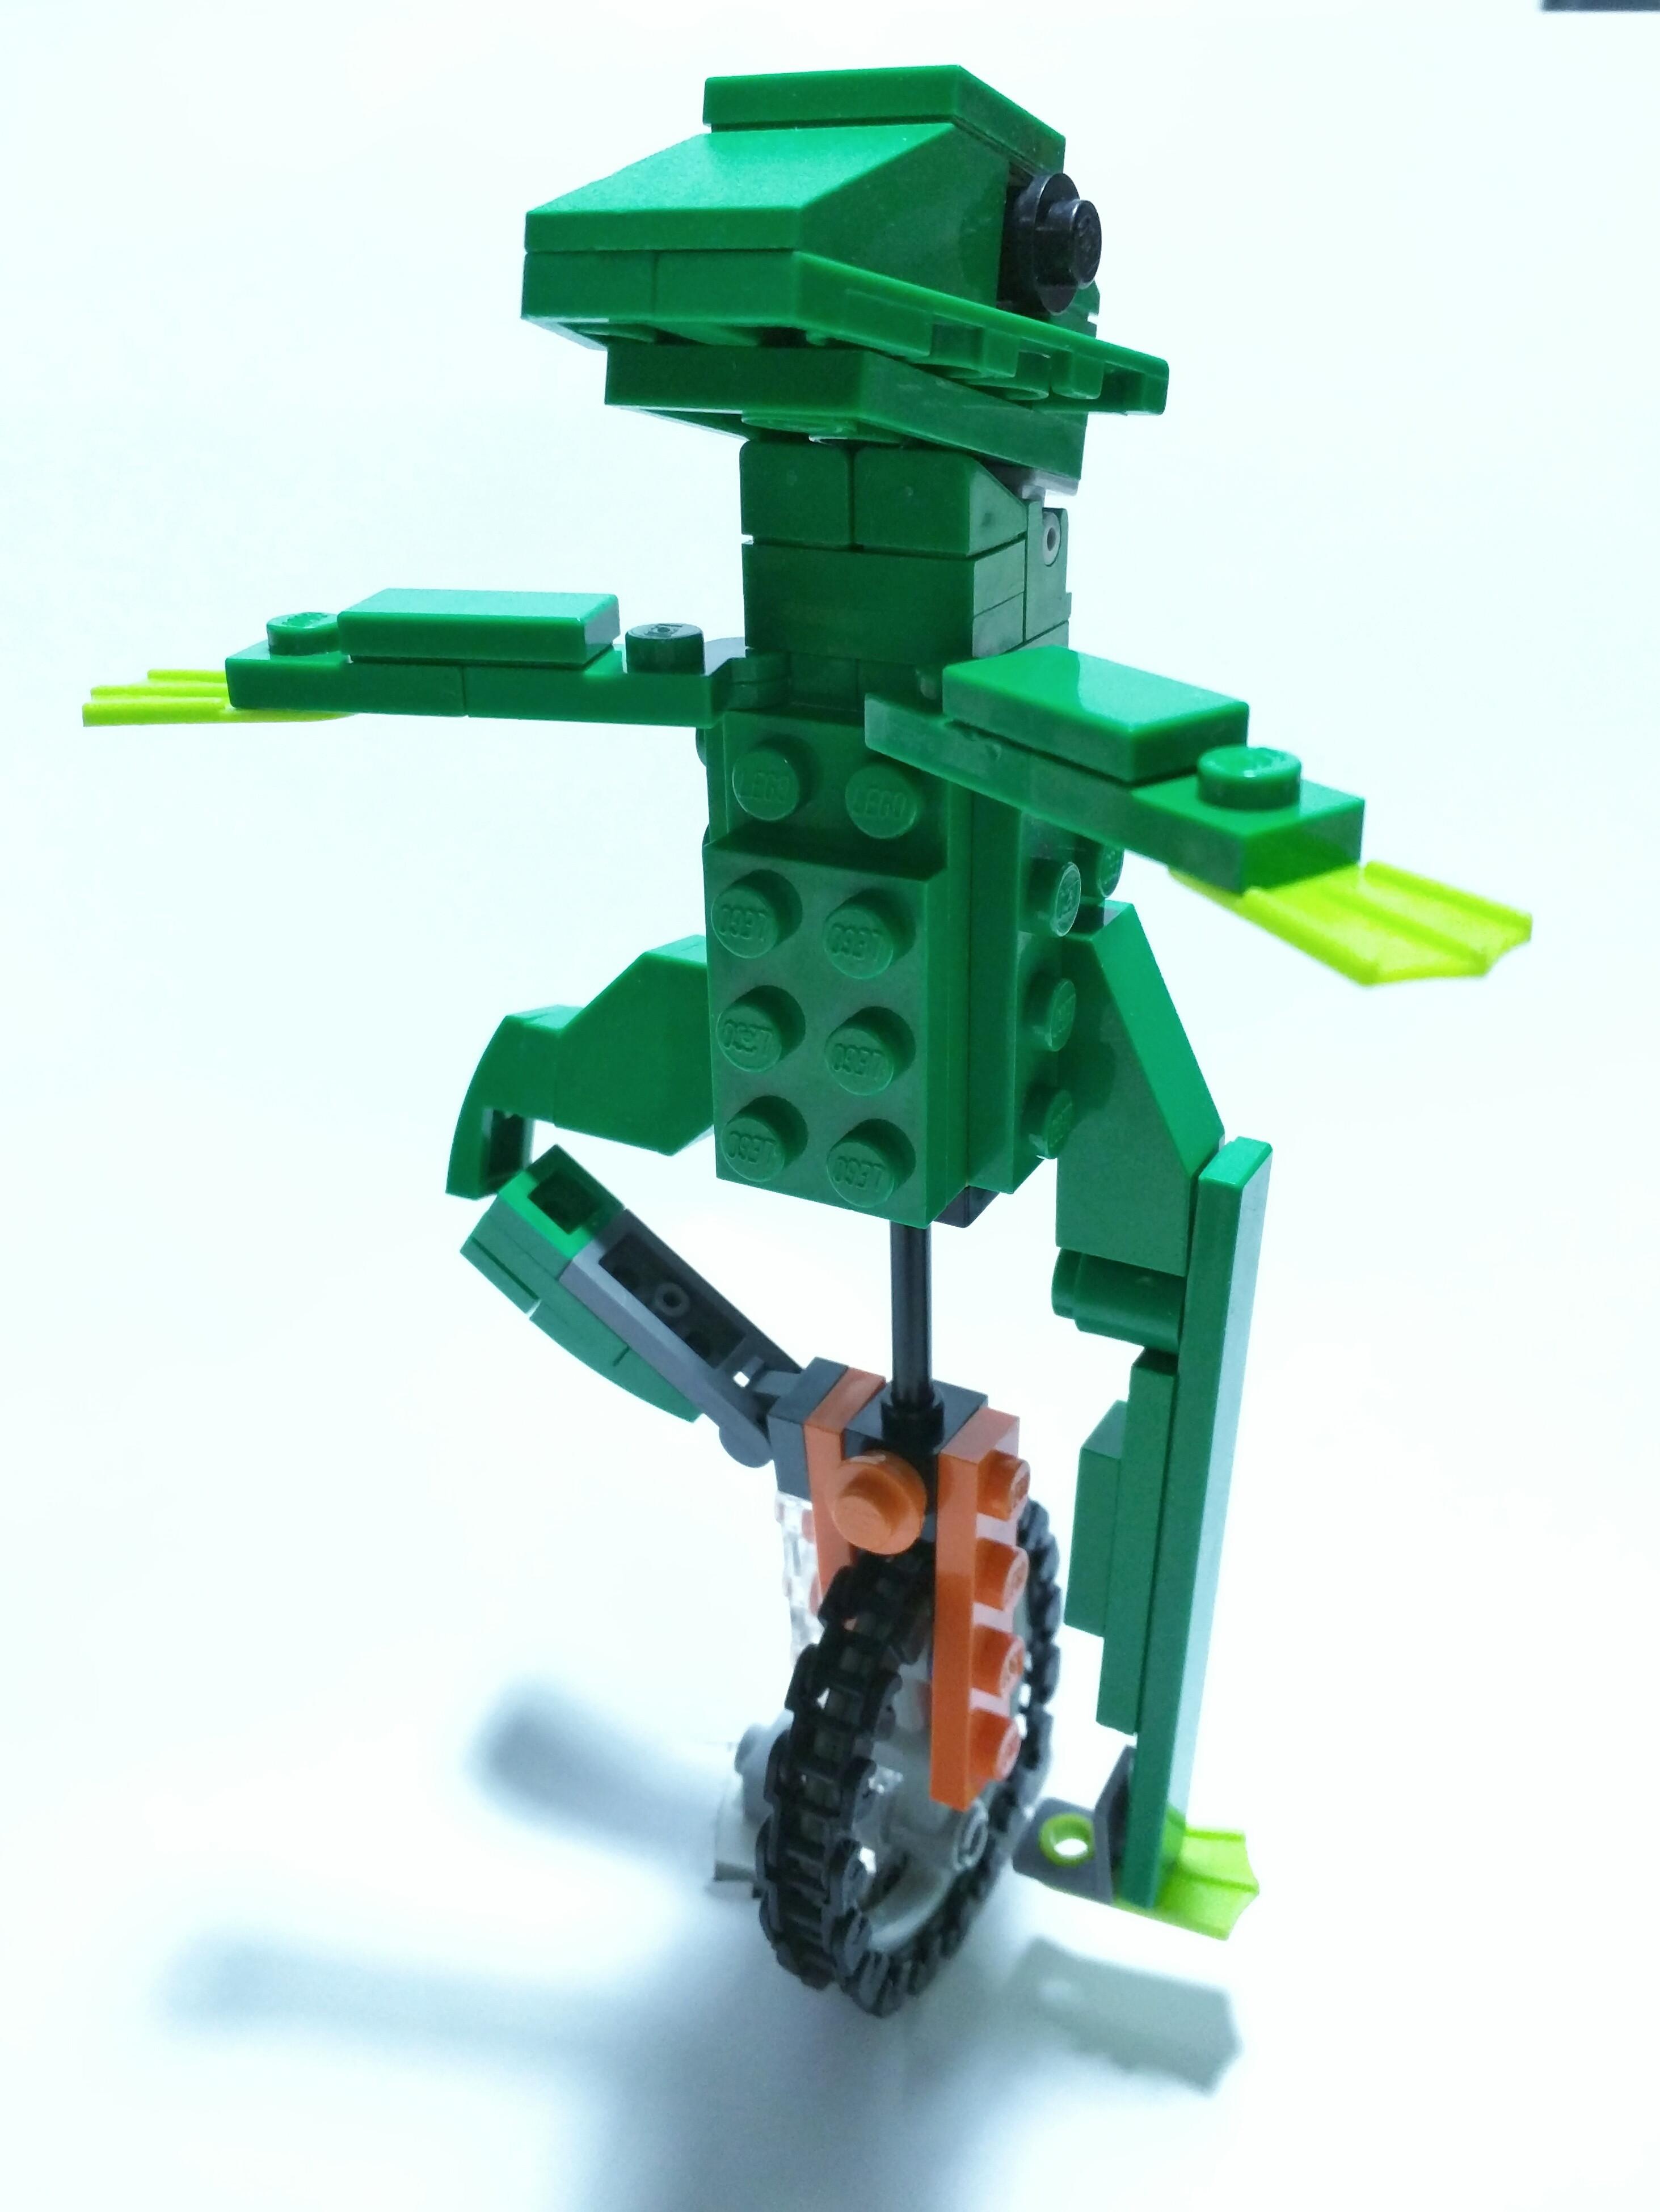 LEGO Edition   Dat Boi   Know Your Meme